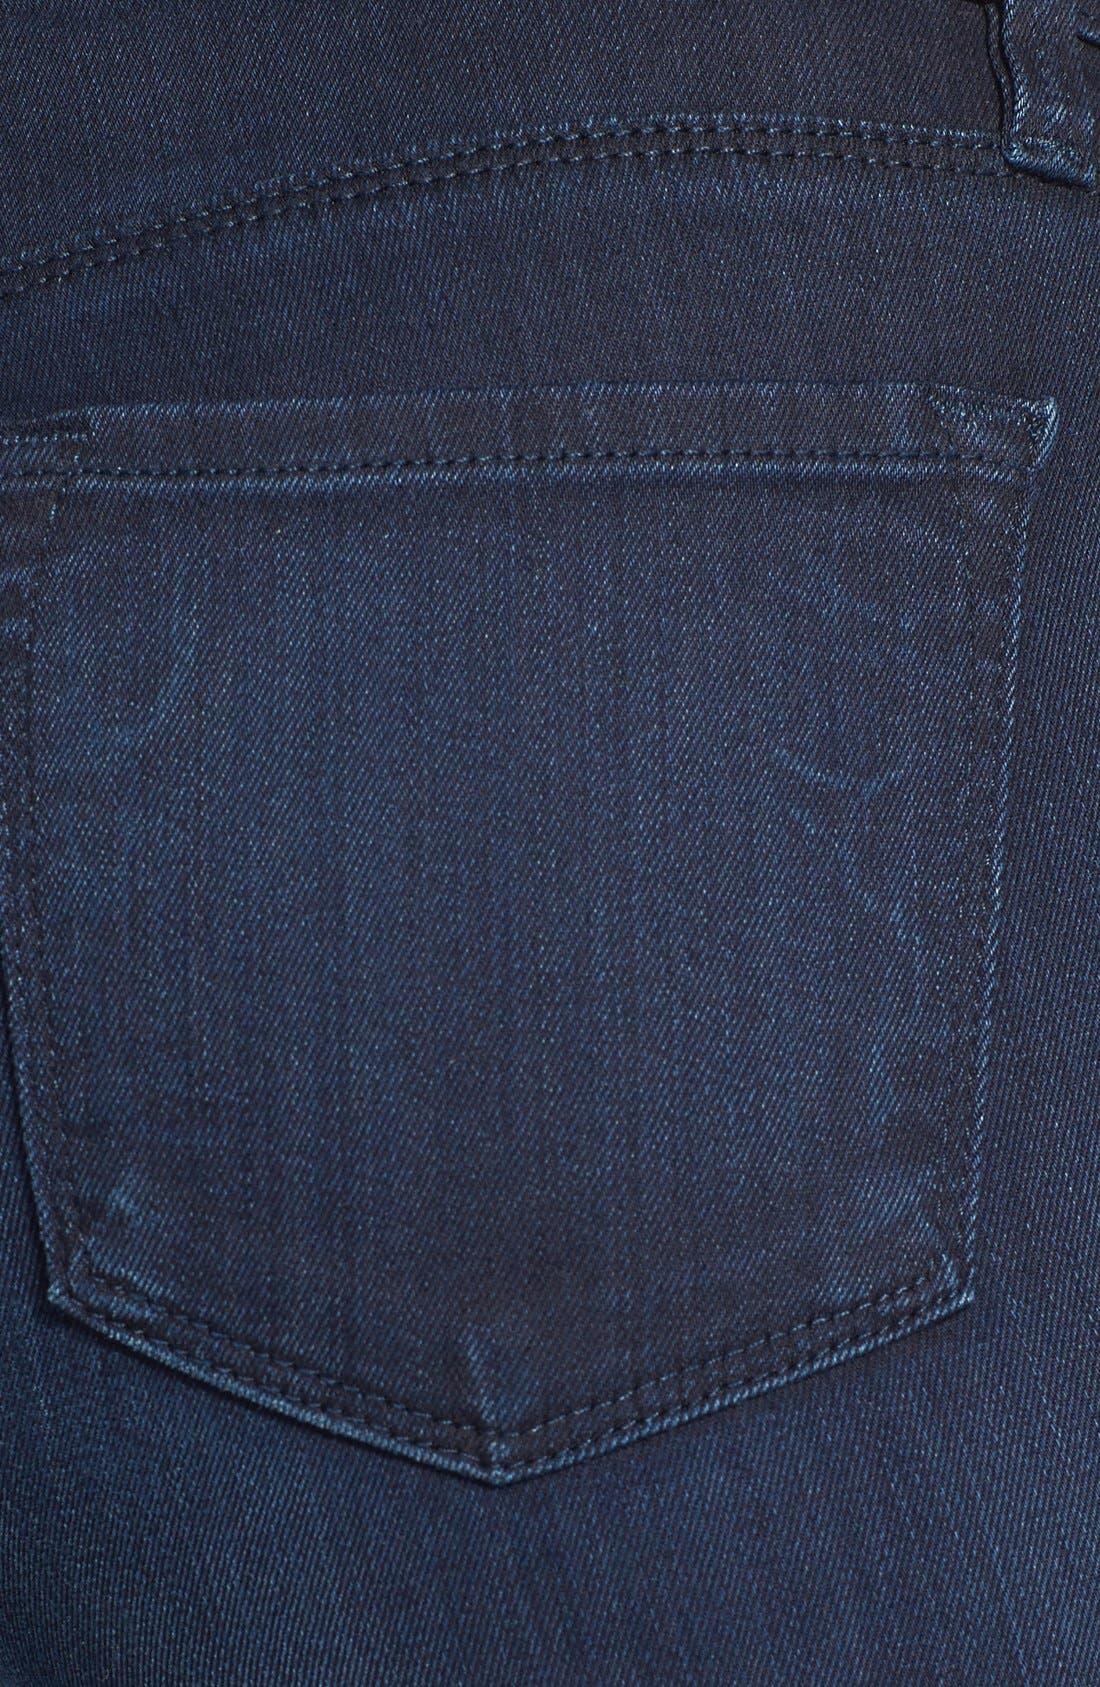 Alternate Image 3  - J Brand '620' Skinny Jeans (Darkness)